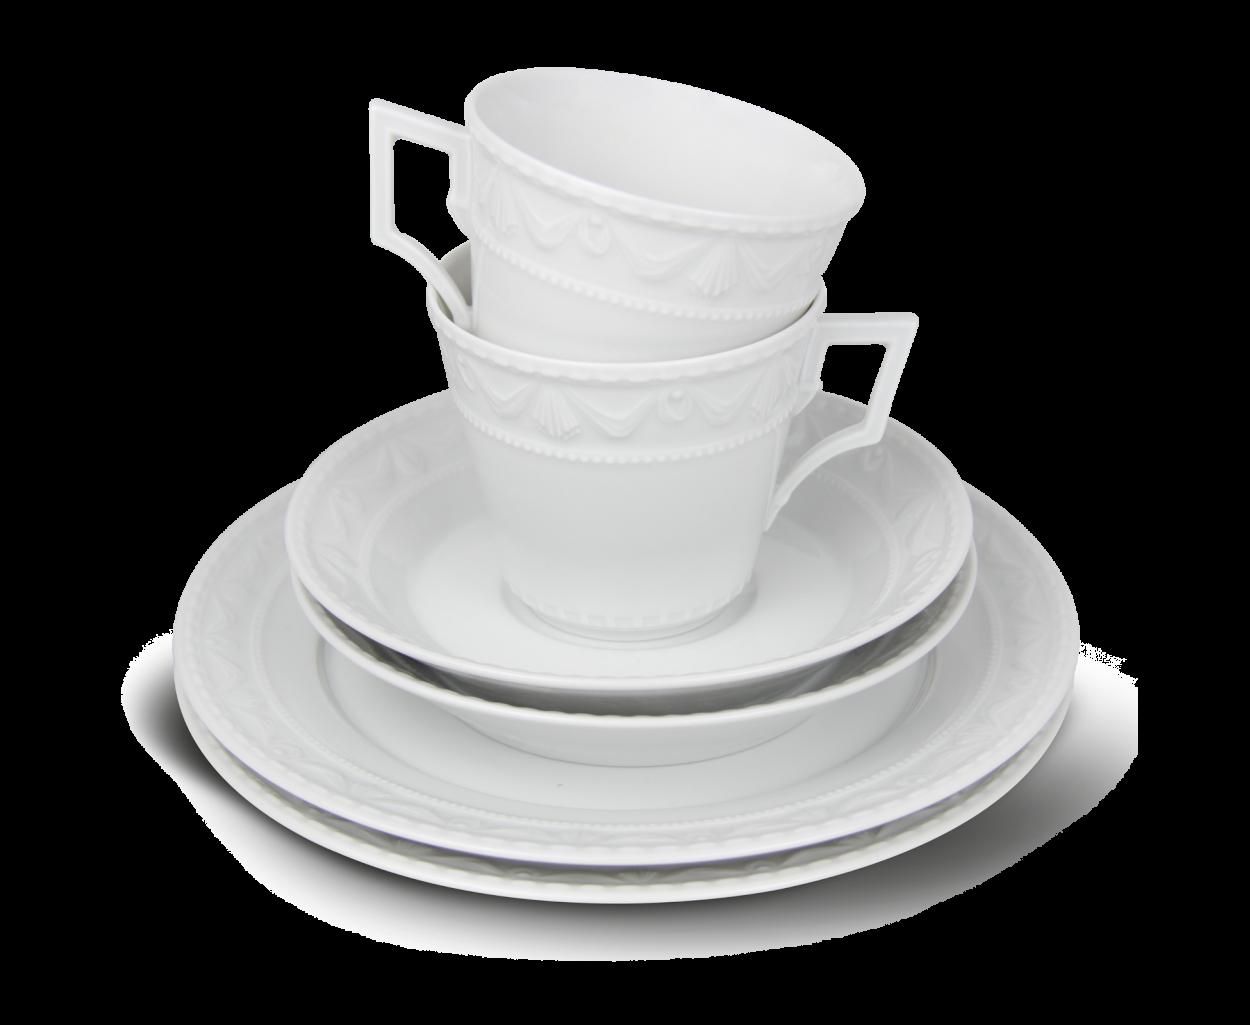 kpm kurland breakfast set f r einsteiger ziegler wohn. Black Bedroom Furniture Sets. Home Design Ideas